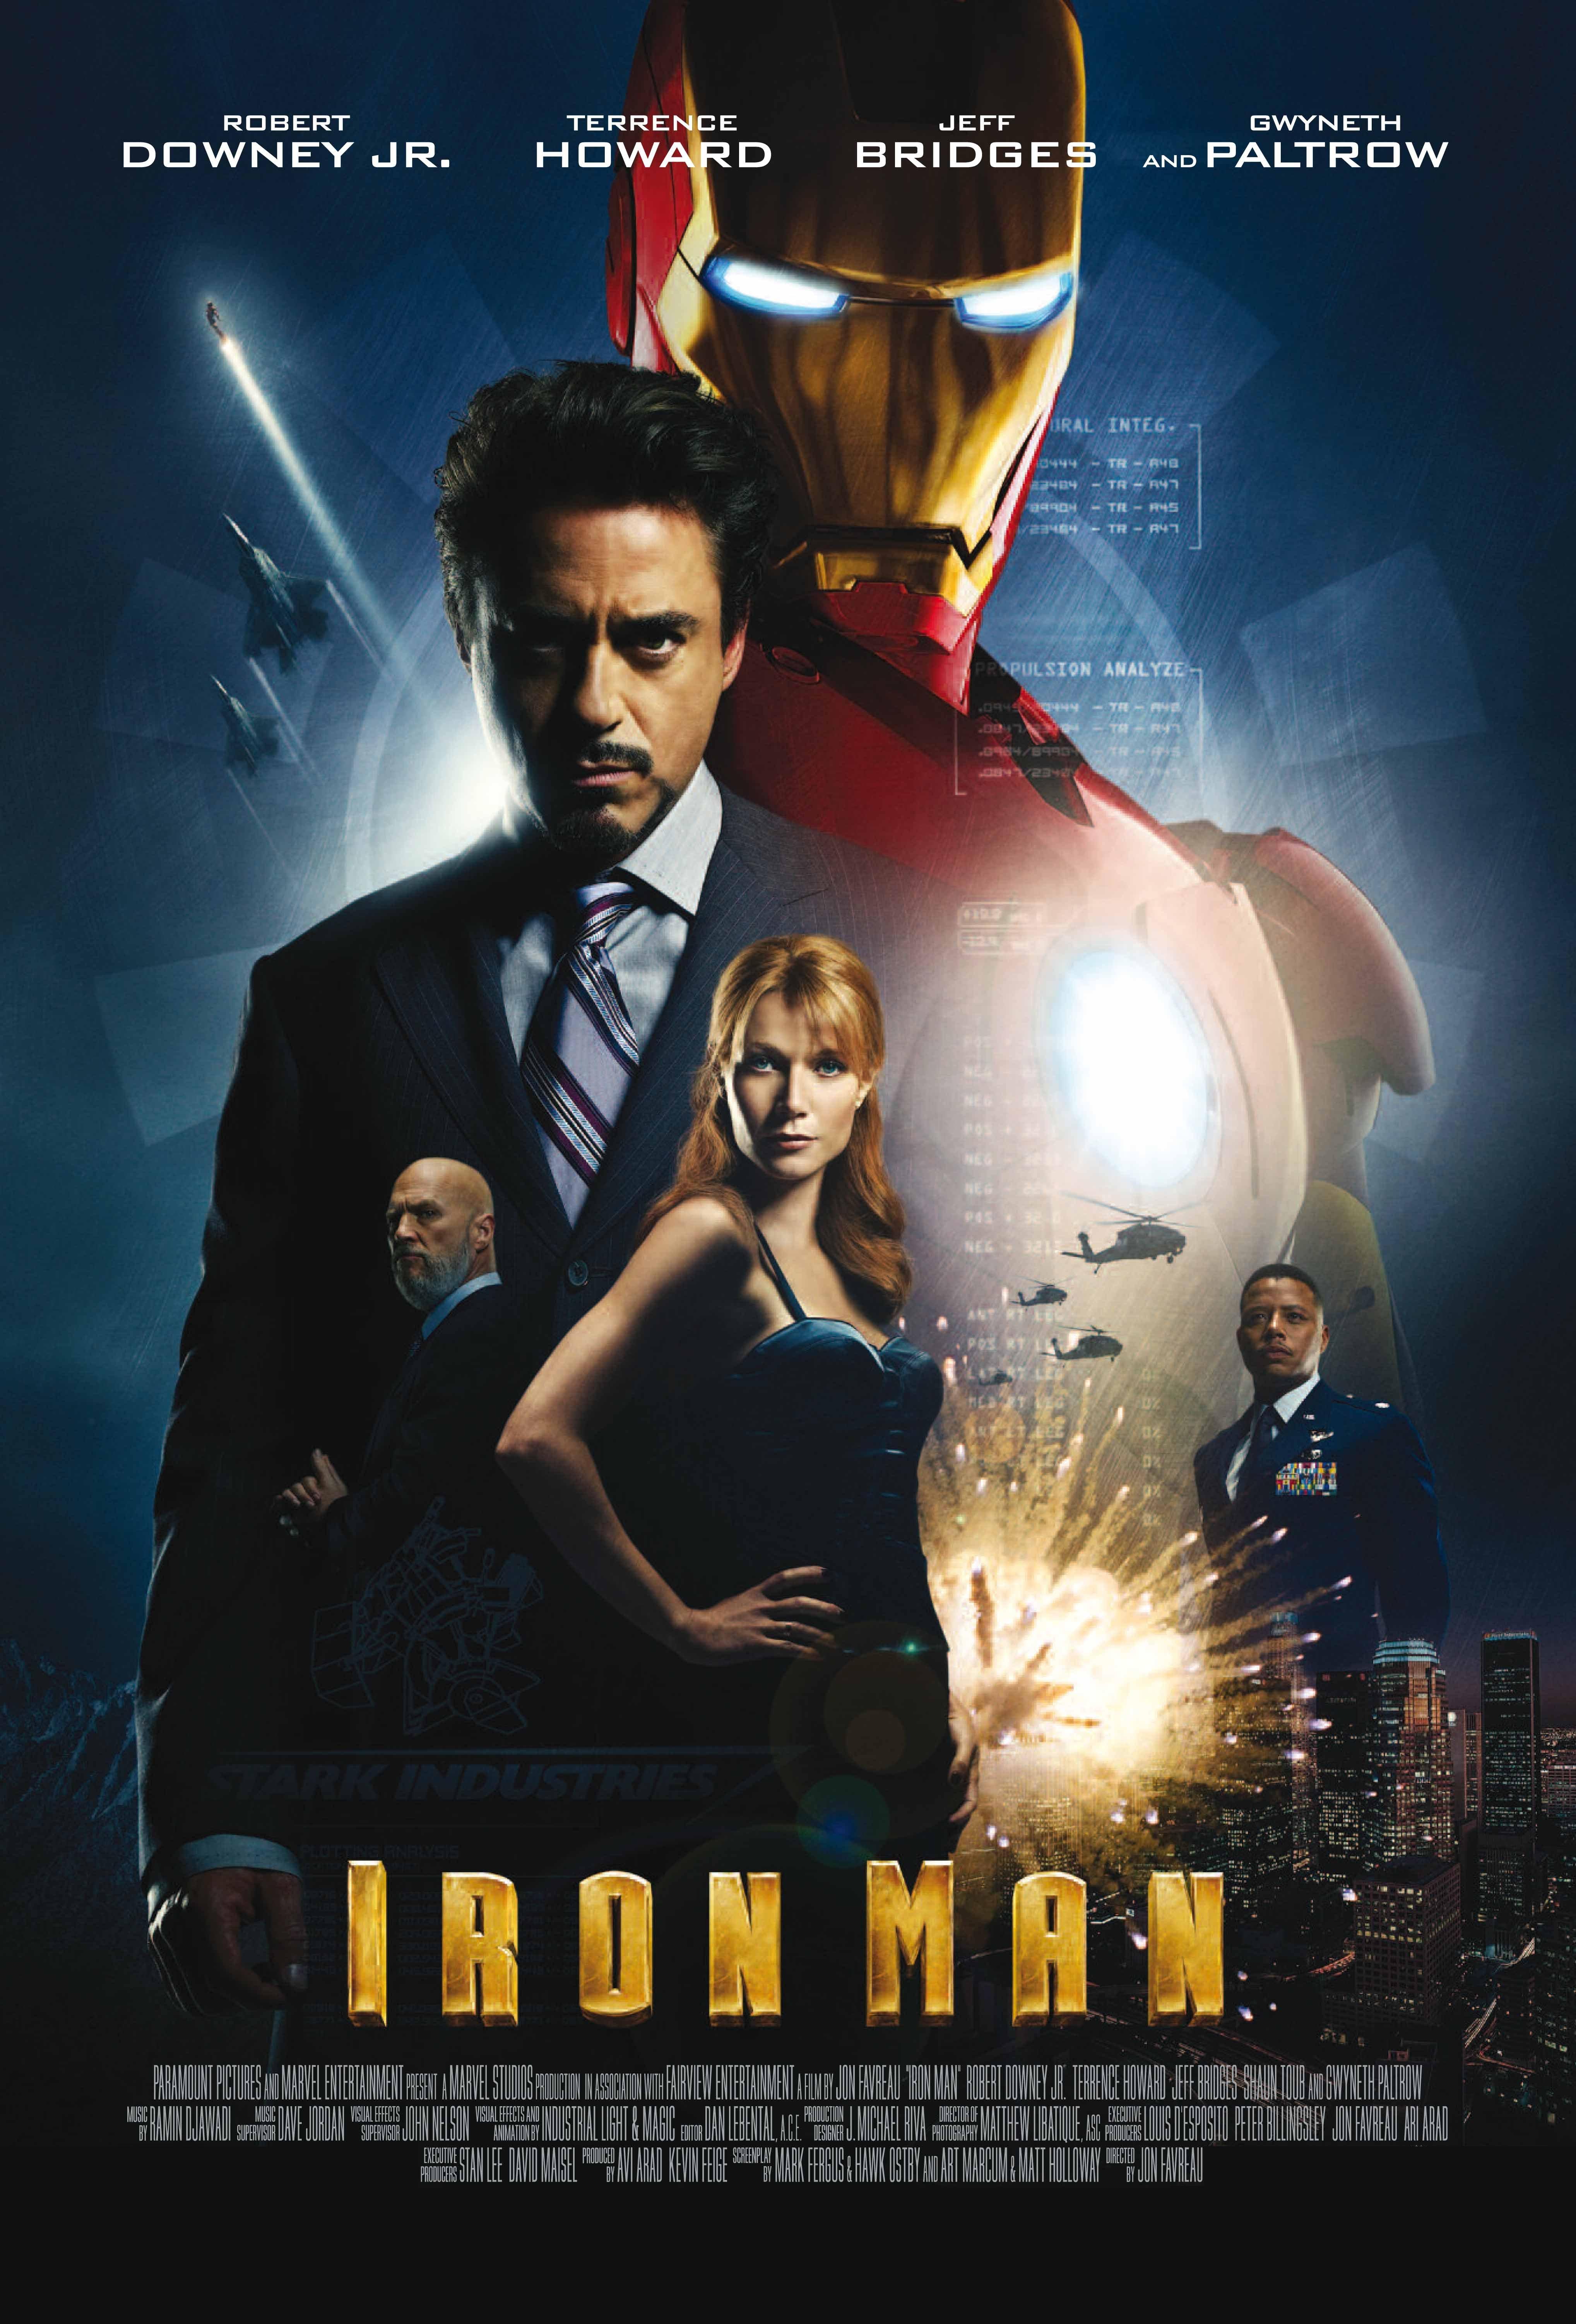 Iron Man Dvd Cover Art Iron Man MovieIron Man Dvd Cover Art